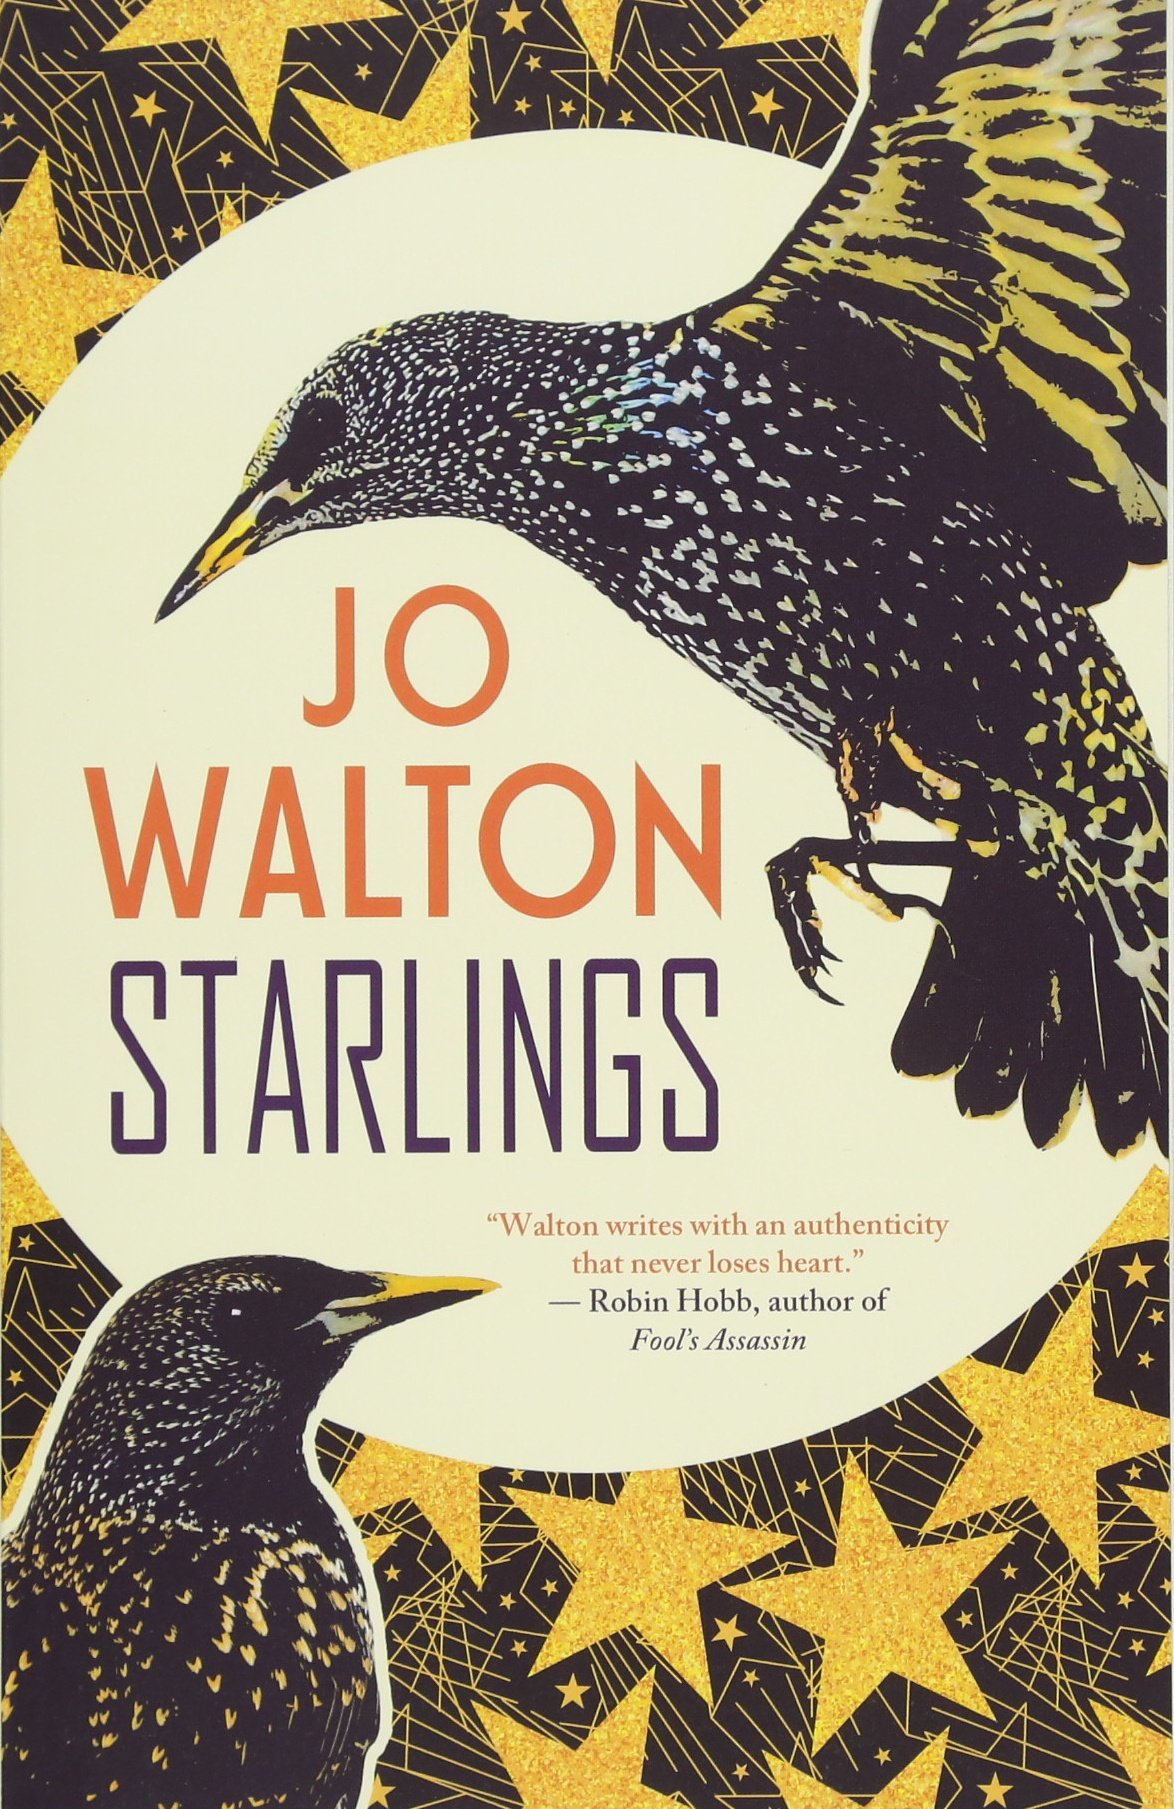 Image result for starlings jo walton